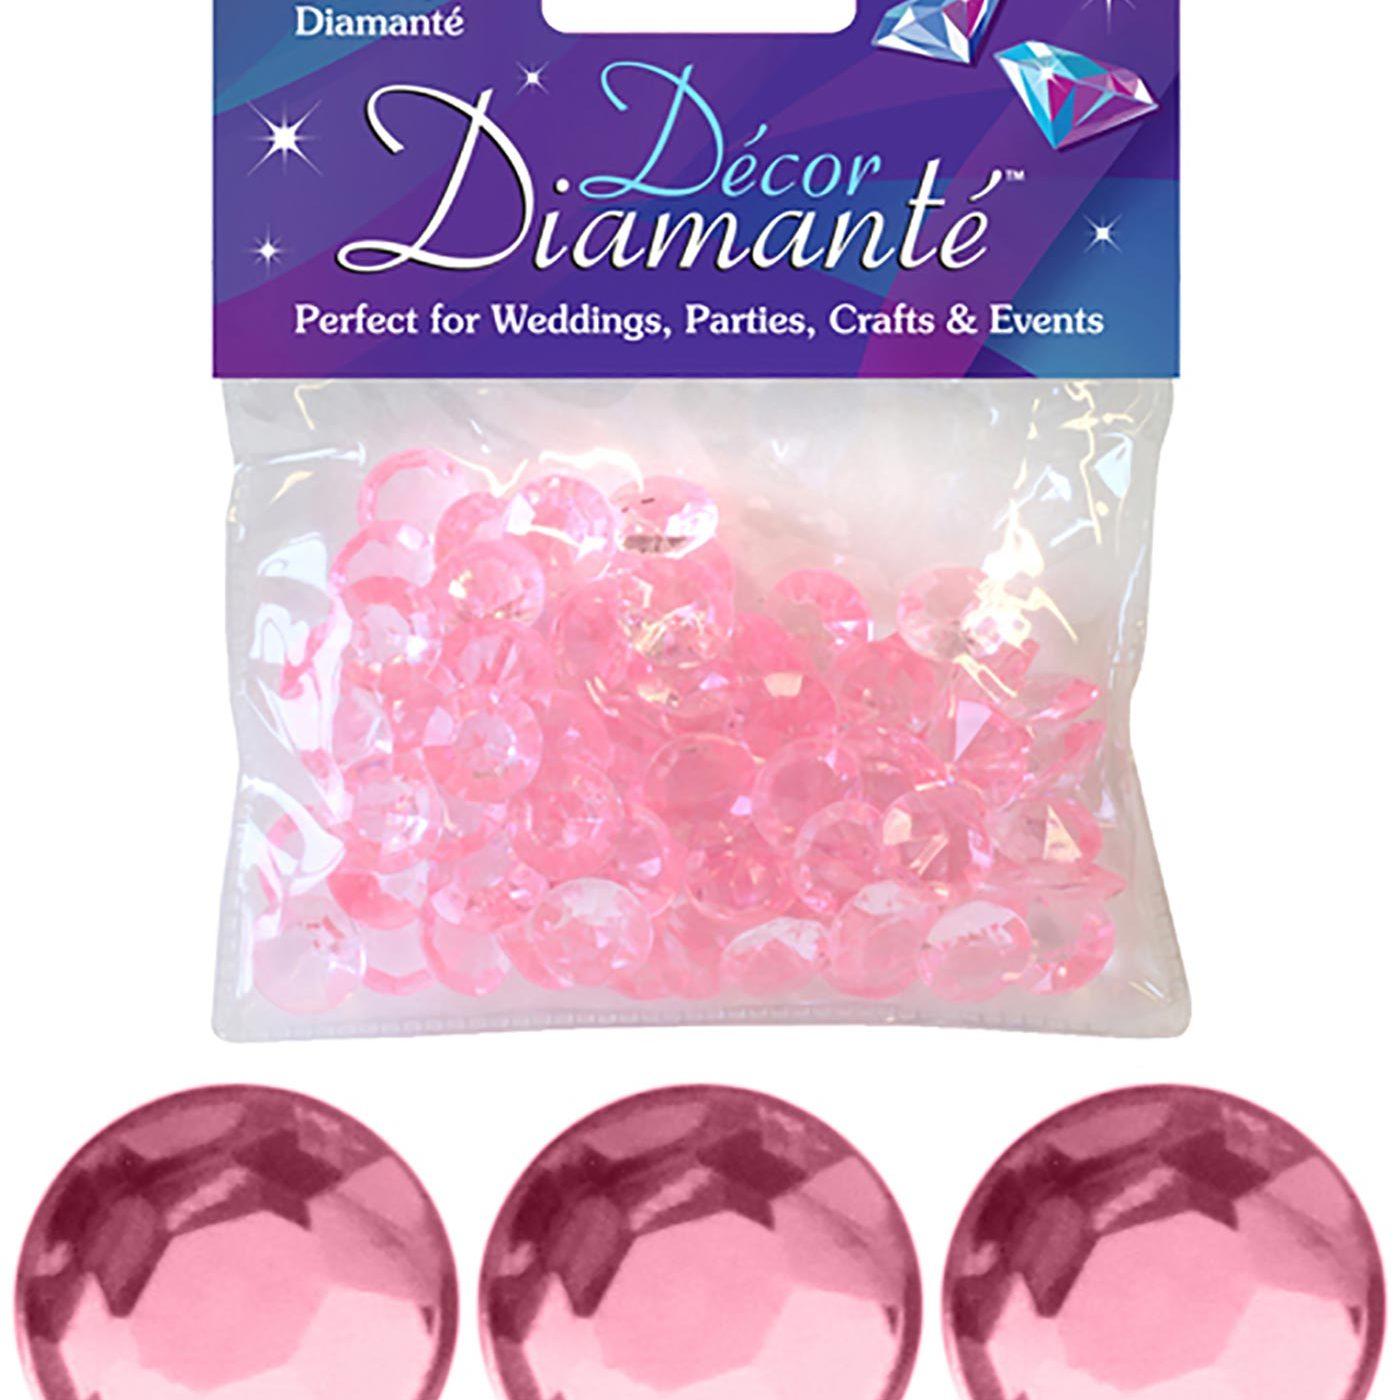 12mm Décor Diamante Diamonds 28g No.21 Pearl Pink